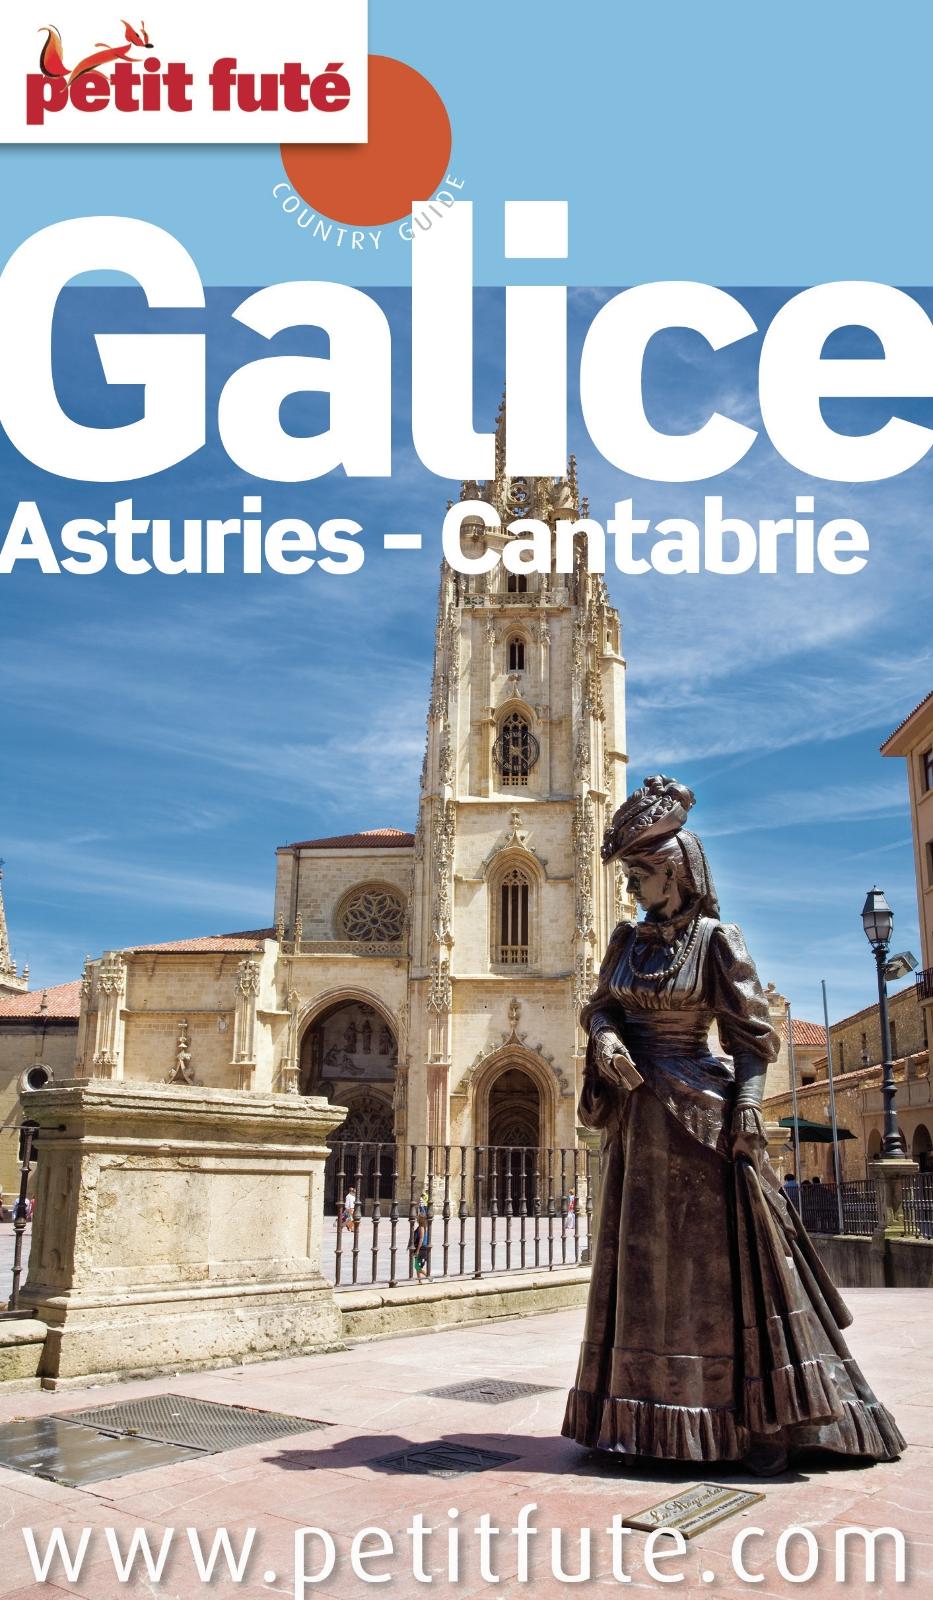 Galice / Asturies 2014 Petit Futé